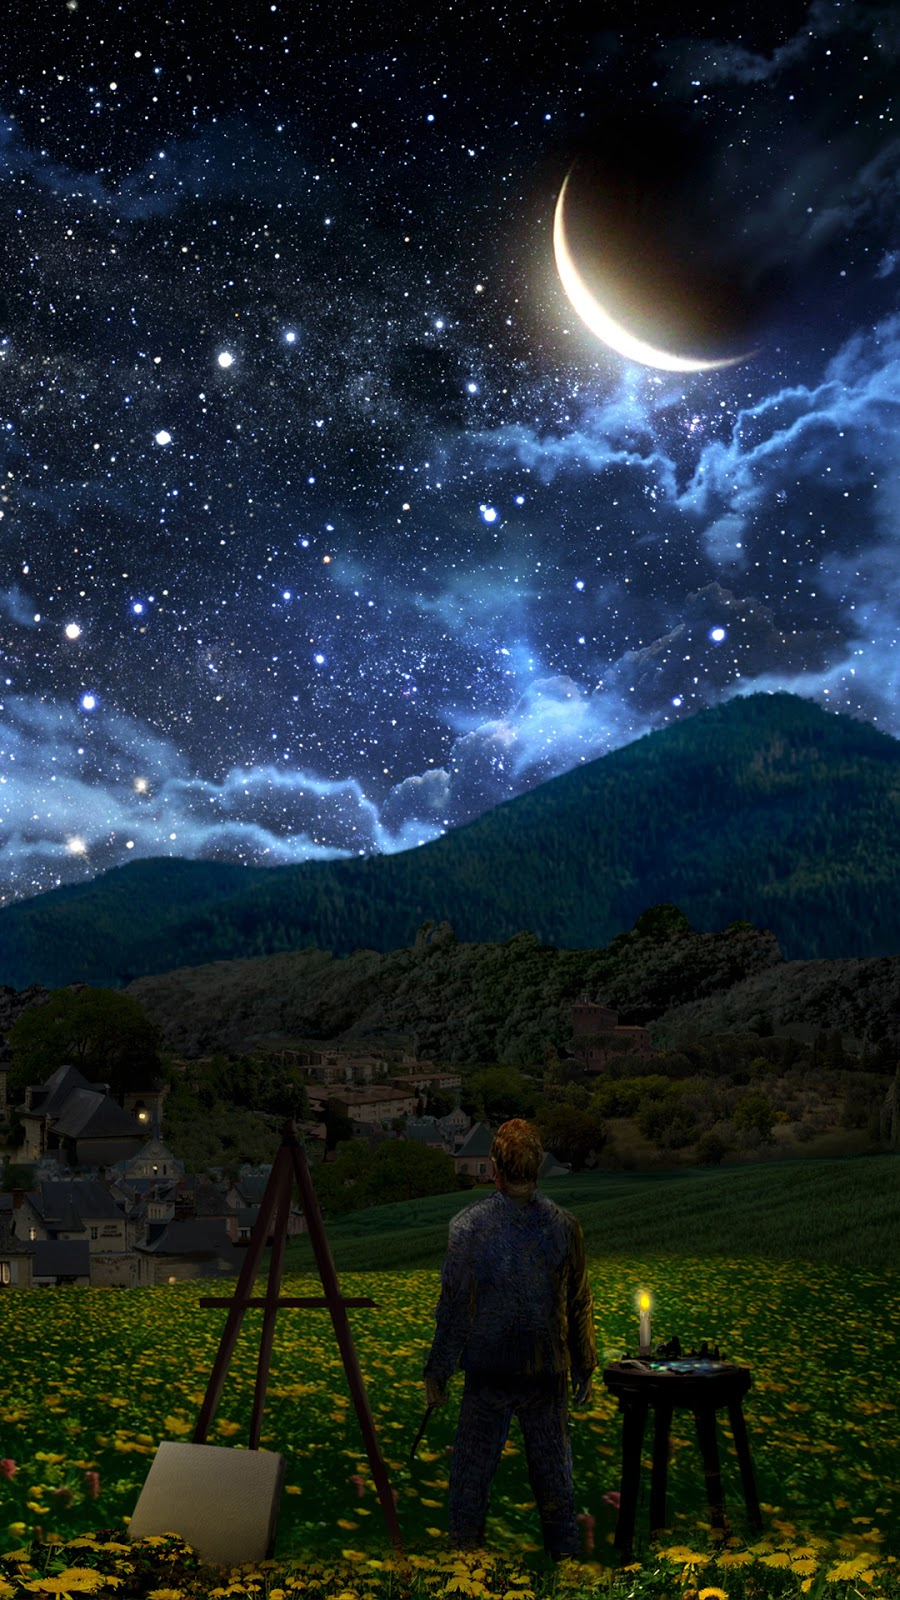 Starry sky in the night